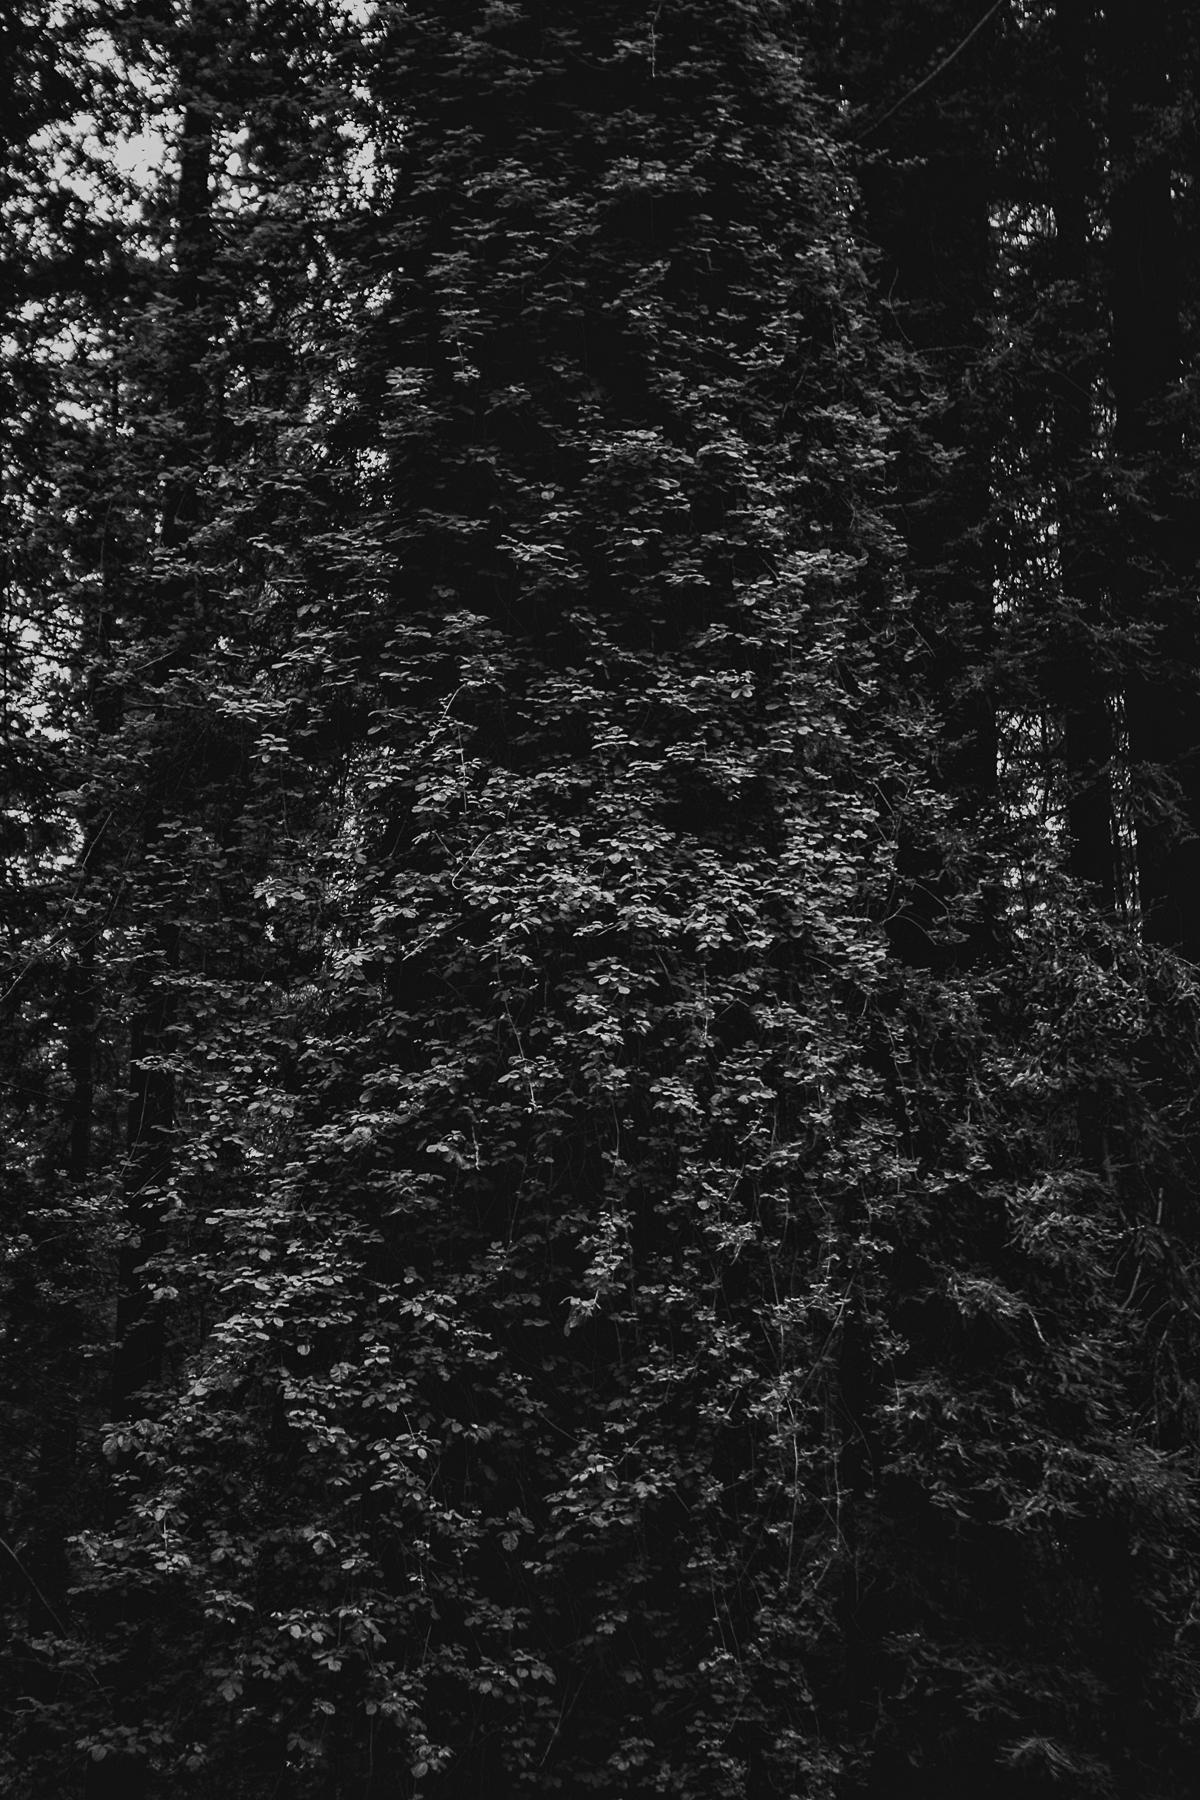 Poison Oak shroud